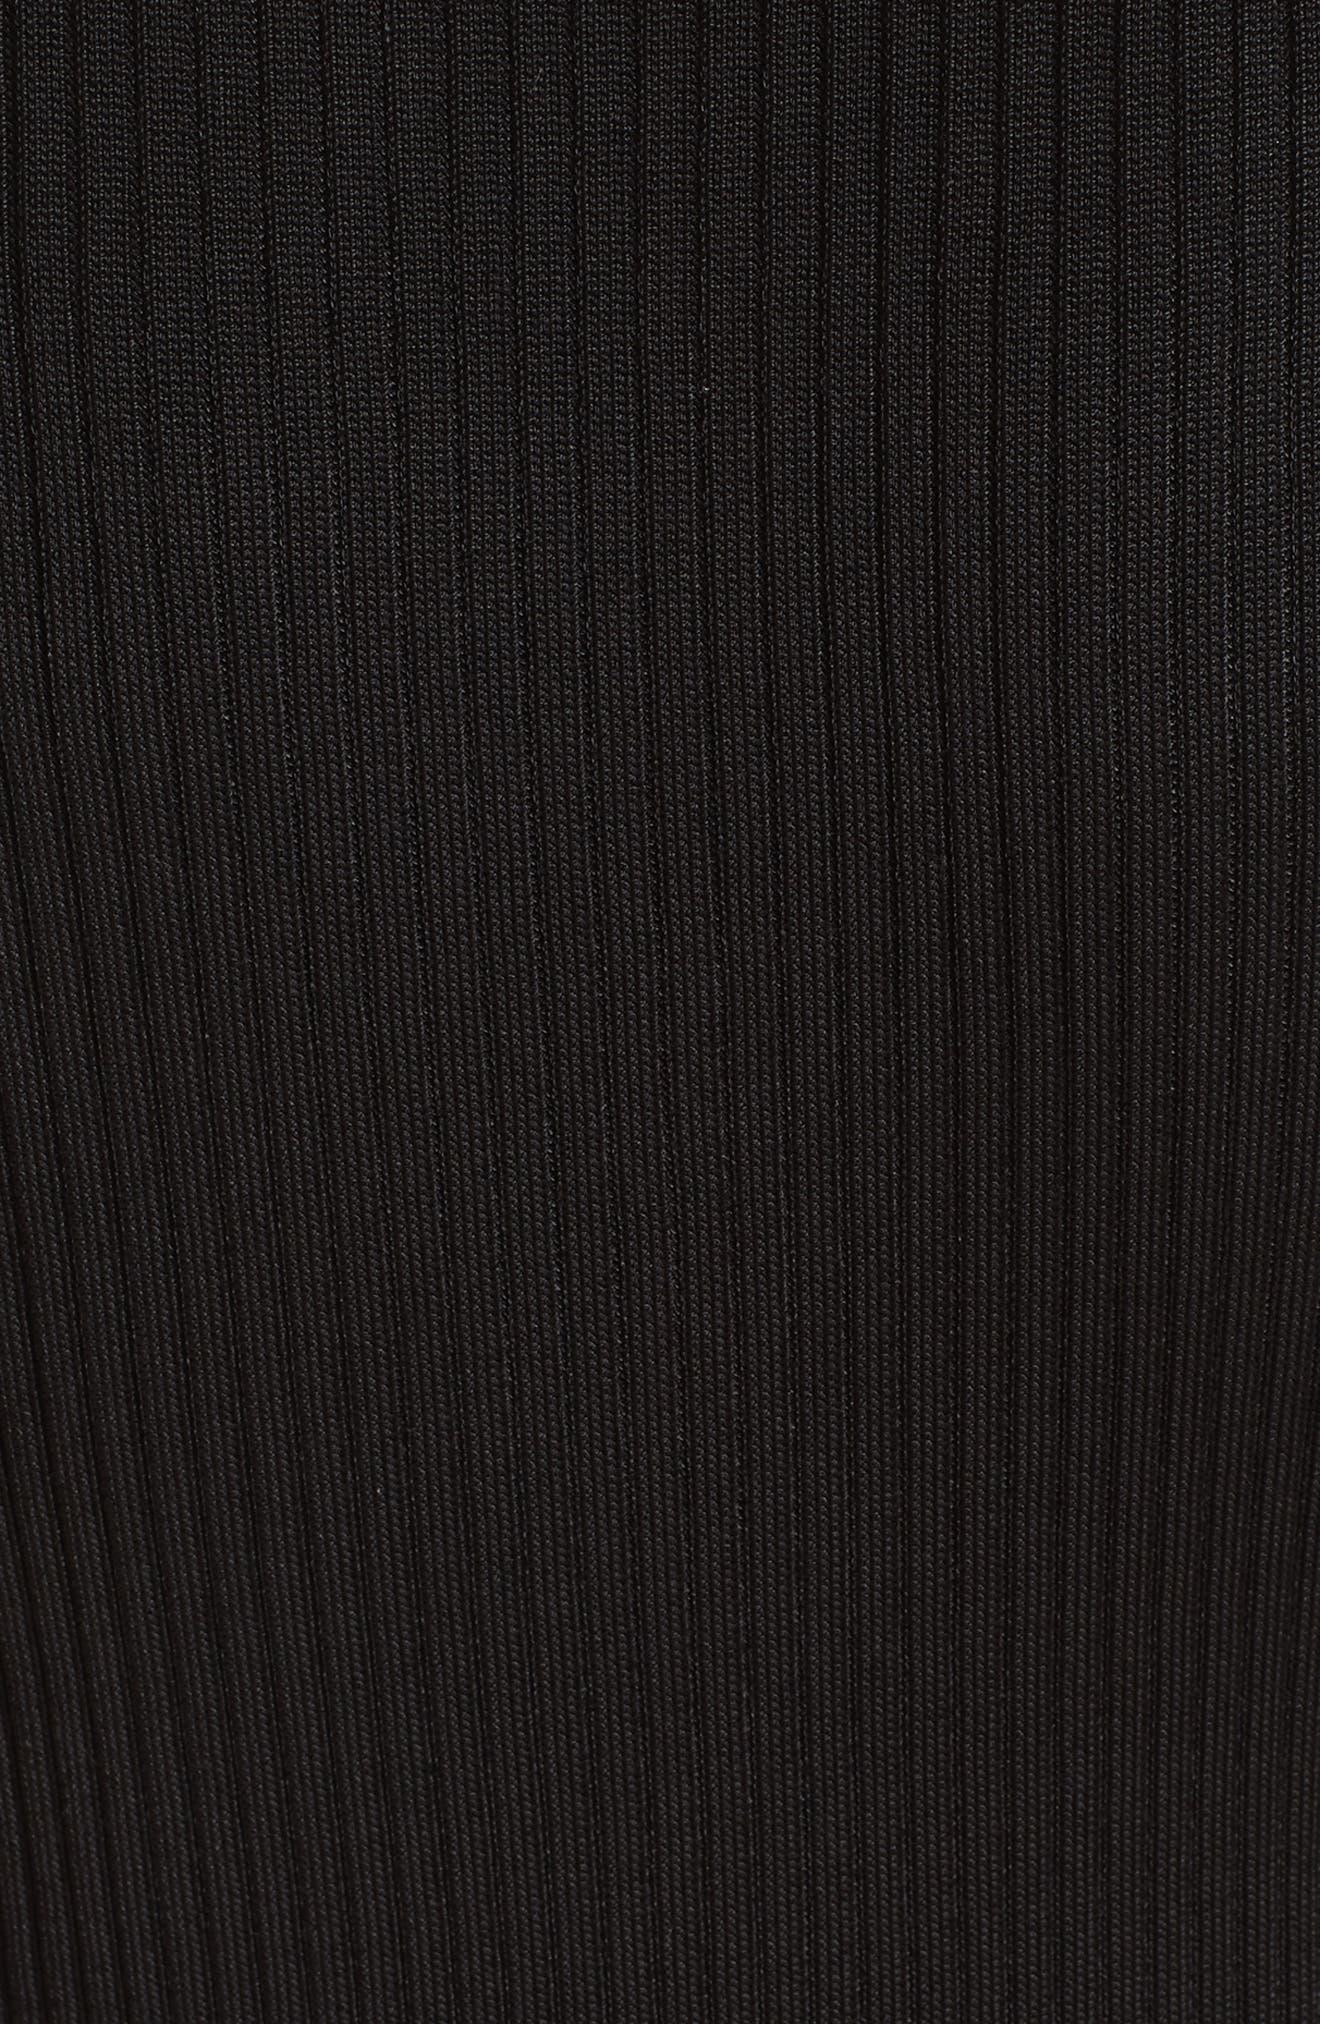 Plated Rib Knit Shell,                             Alternate thumbnail 5, color,                             CAVIAR